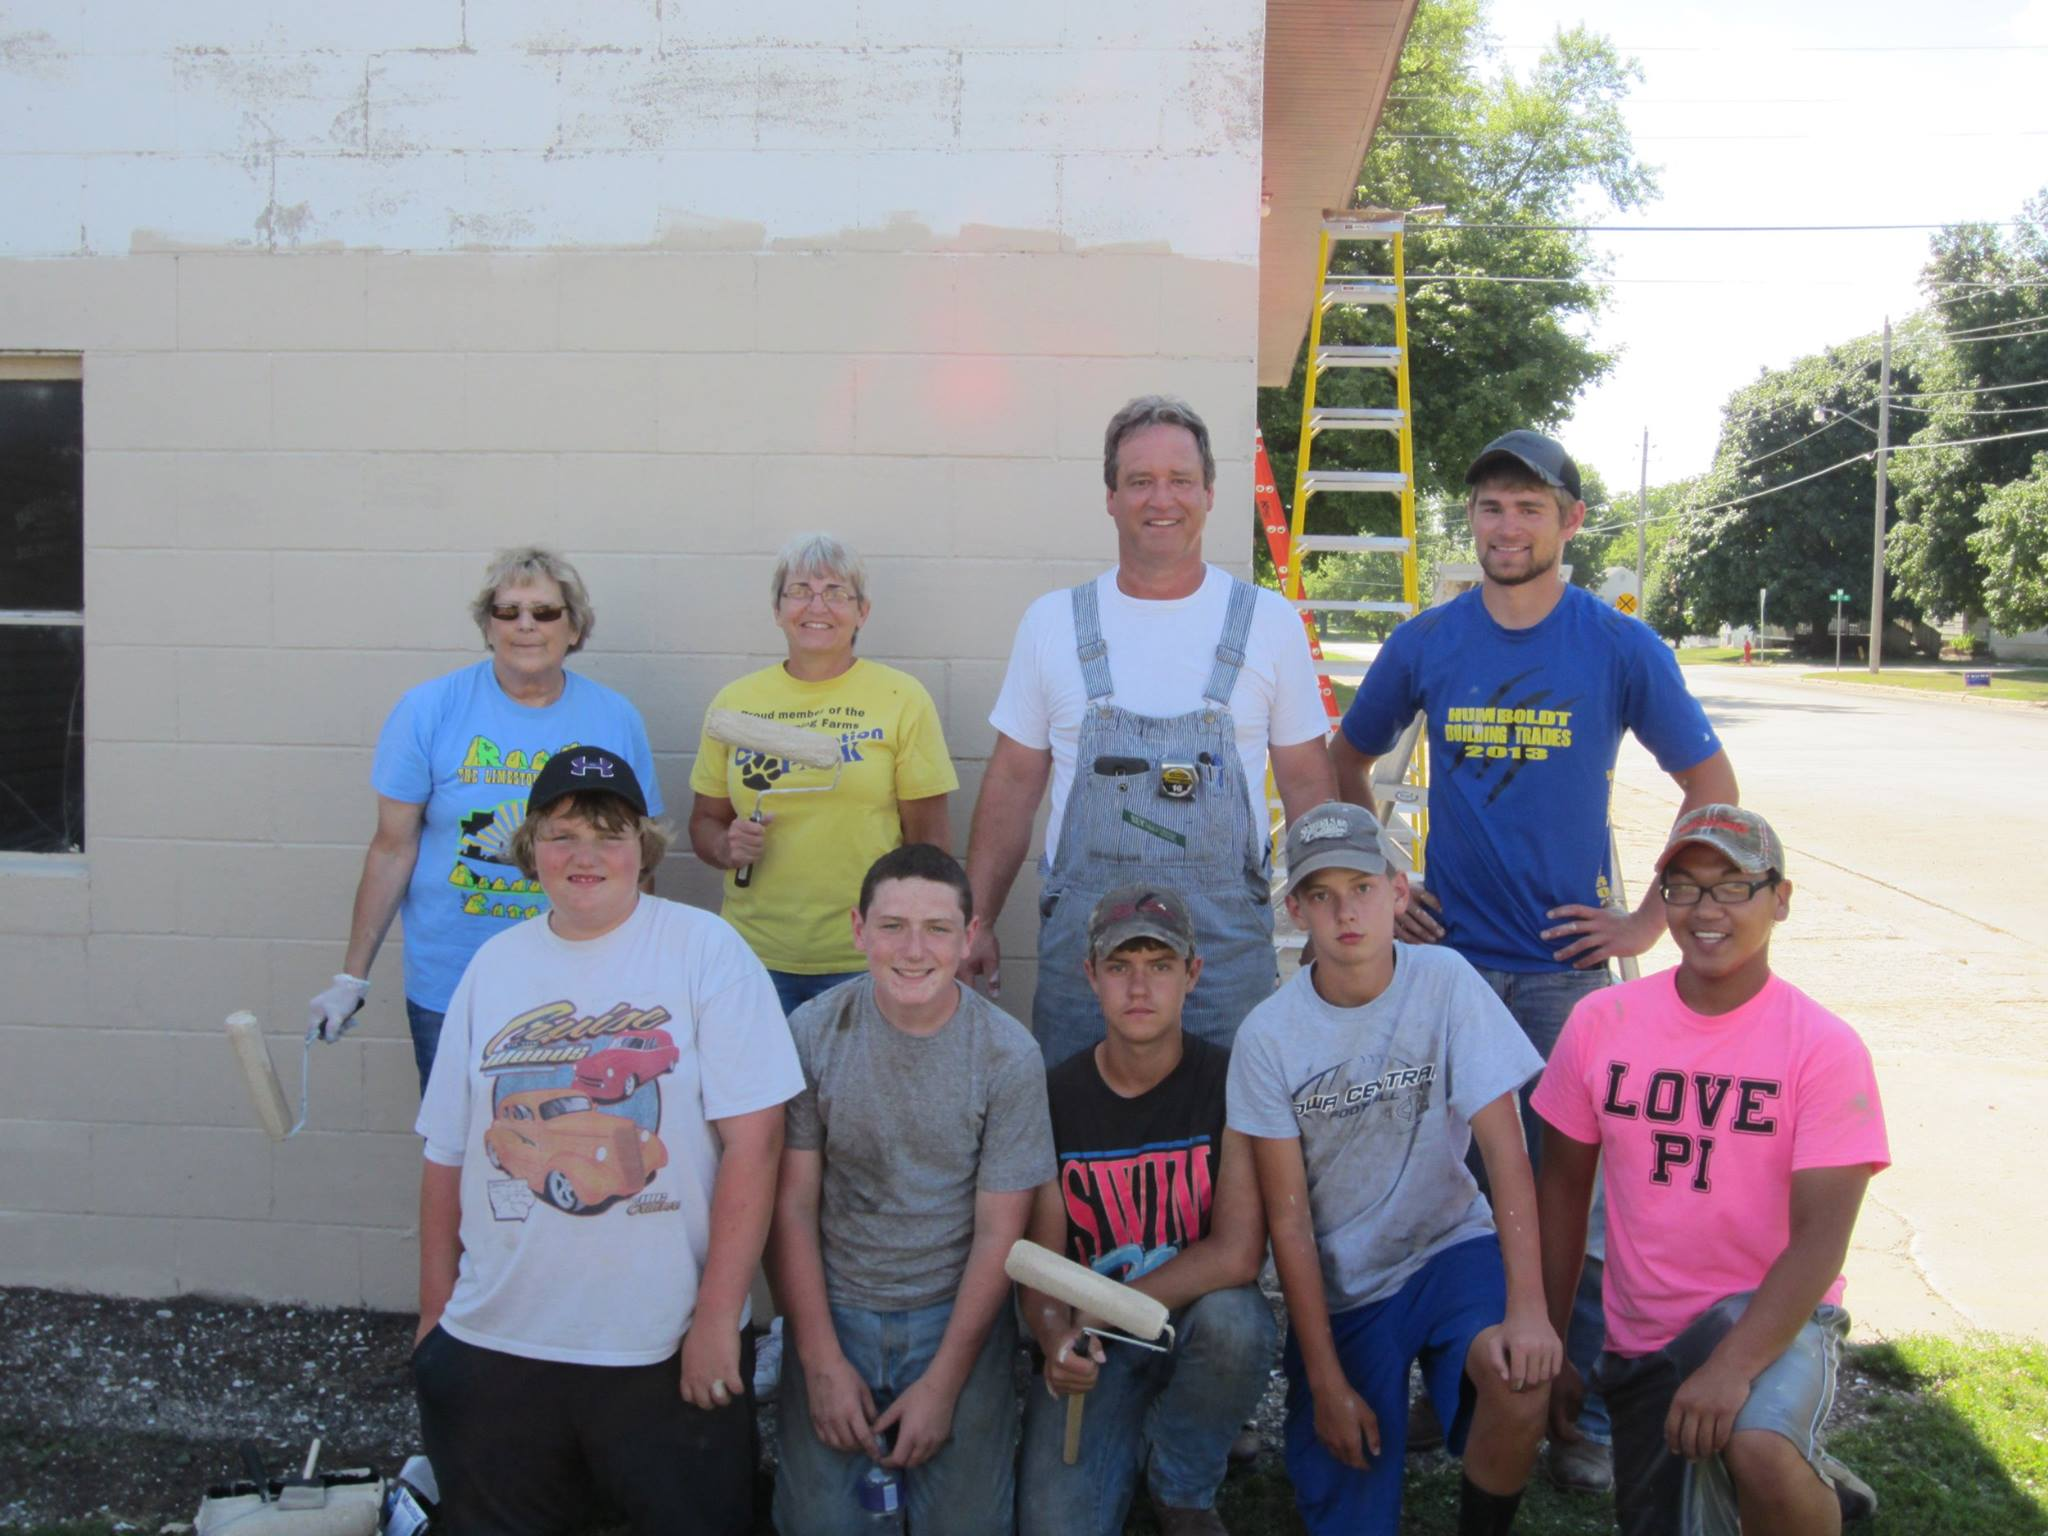 Gilmore City Hometown Pride volunteers working on Paint Iowa Beautiful grant project